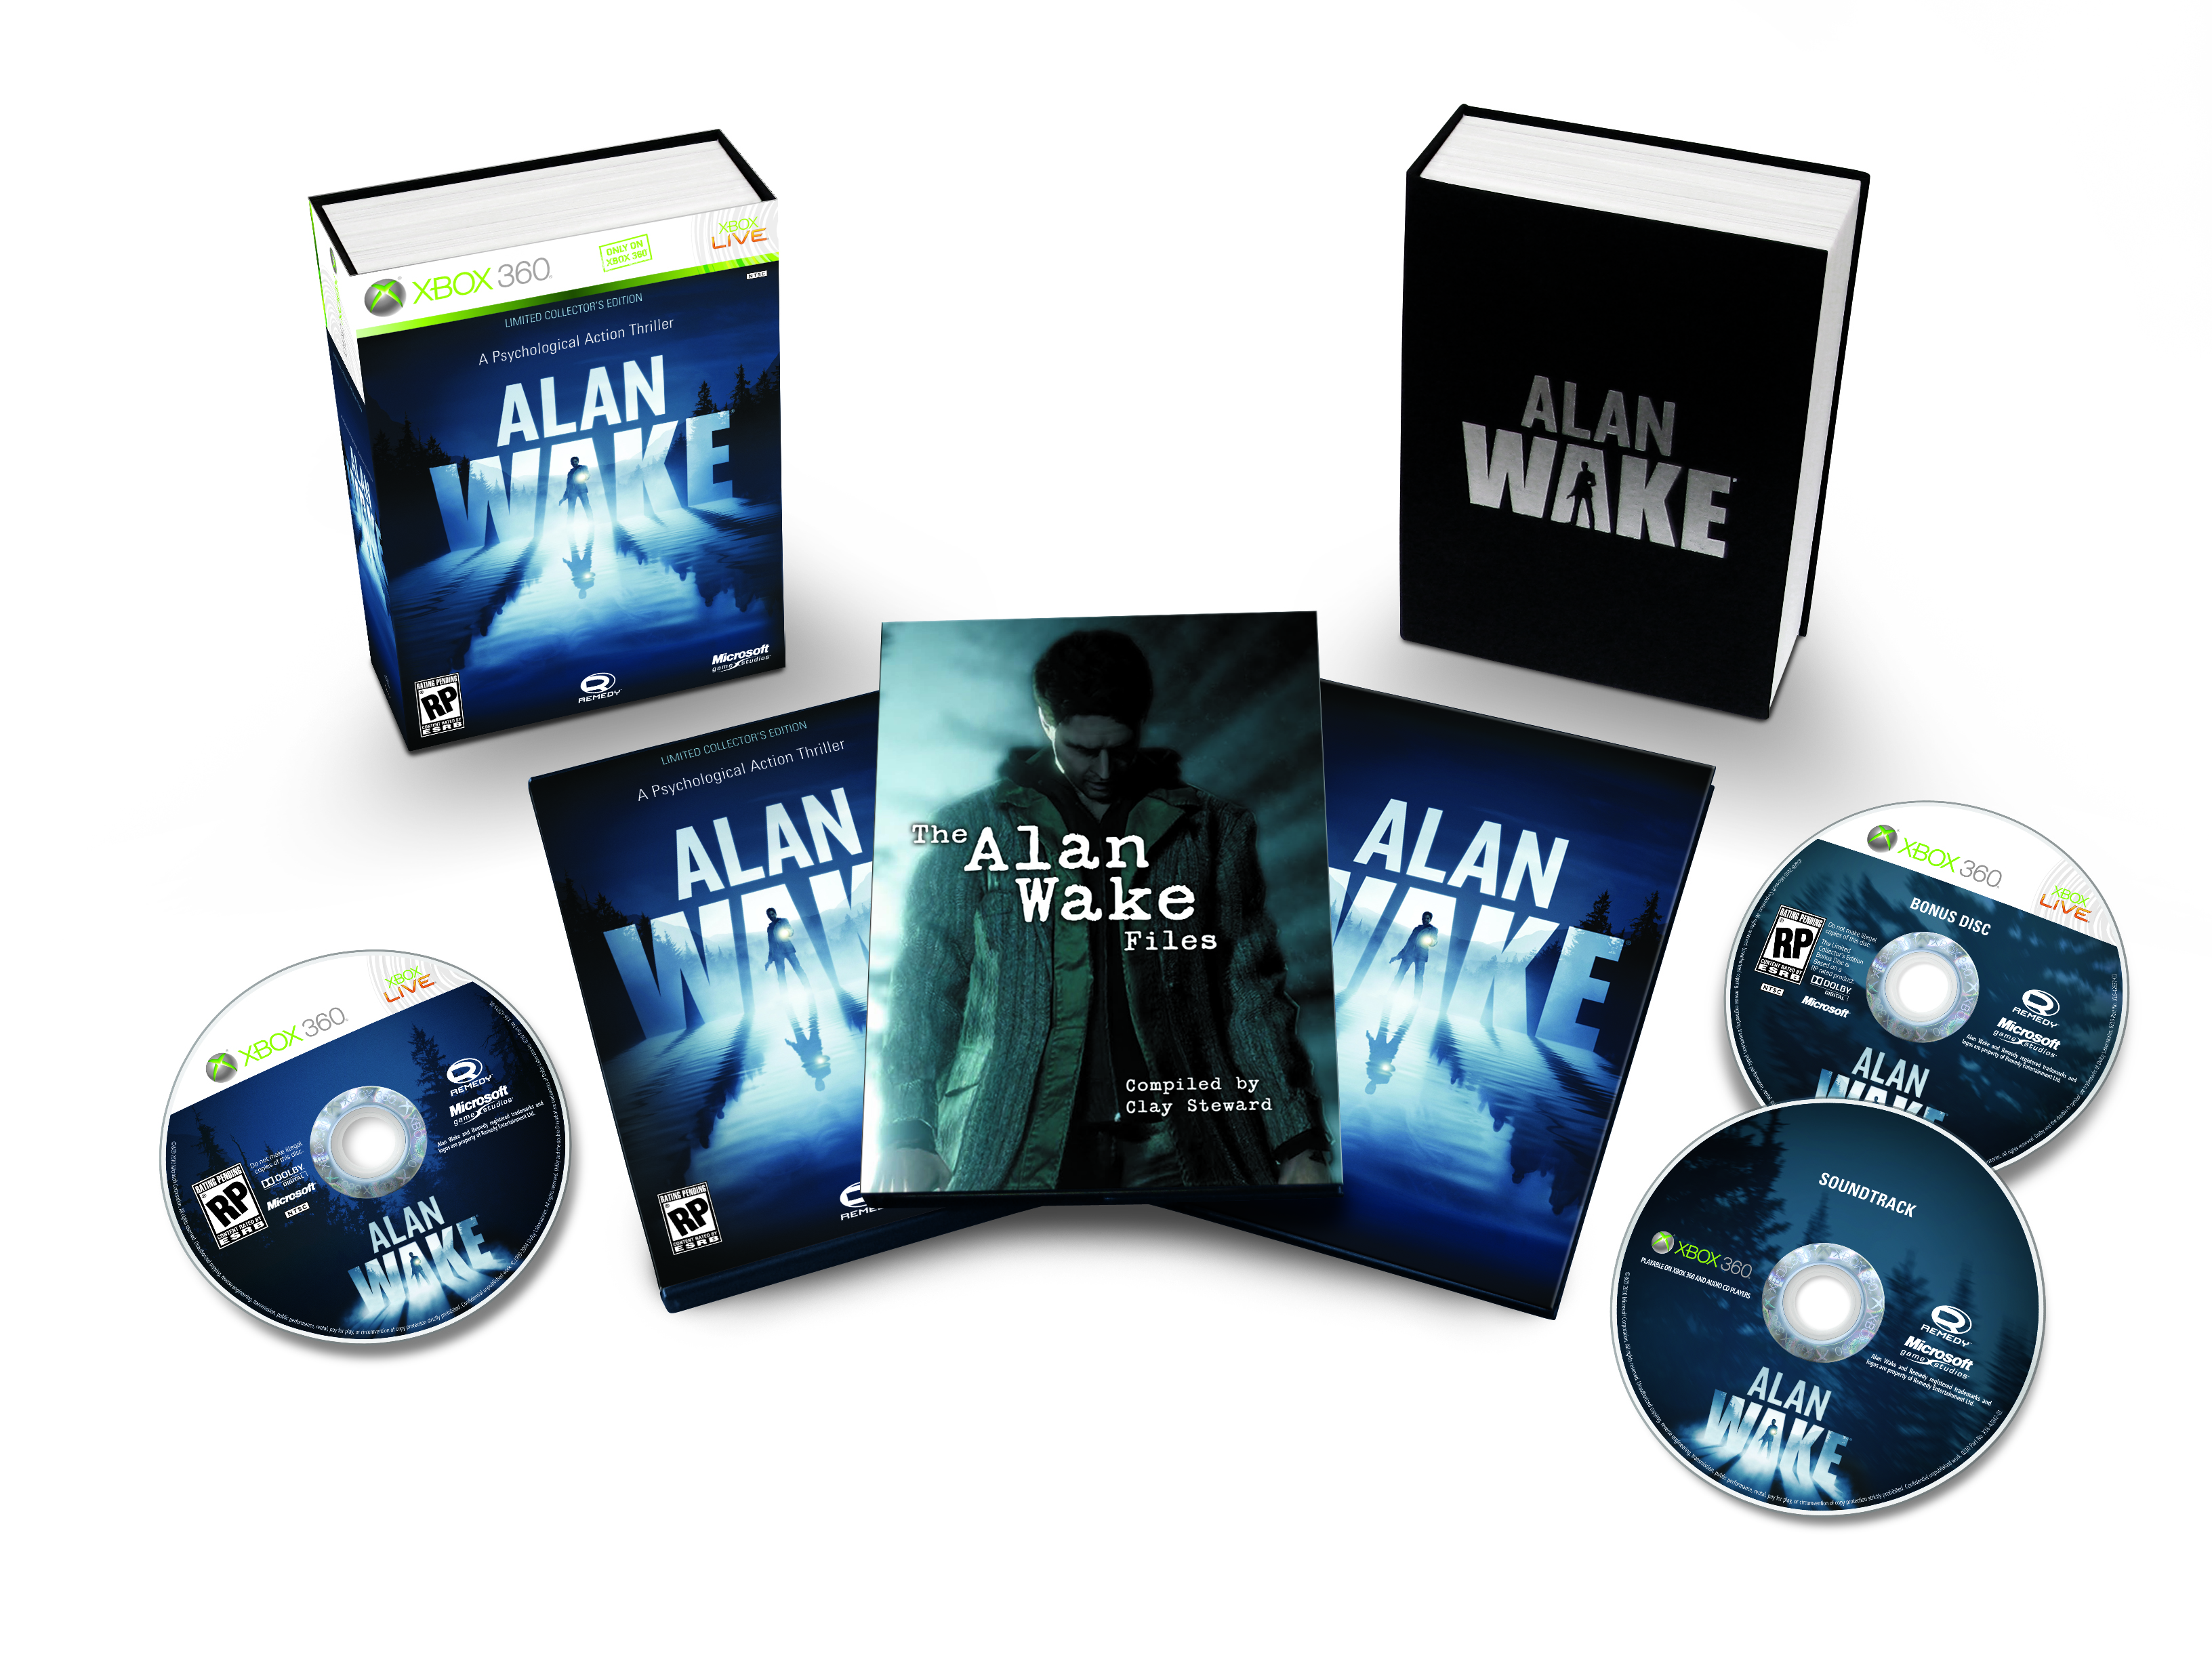 Alan Wake Collector X360